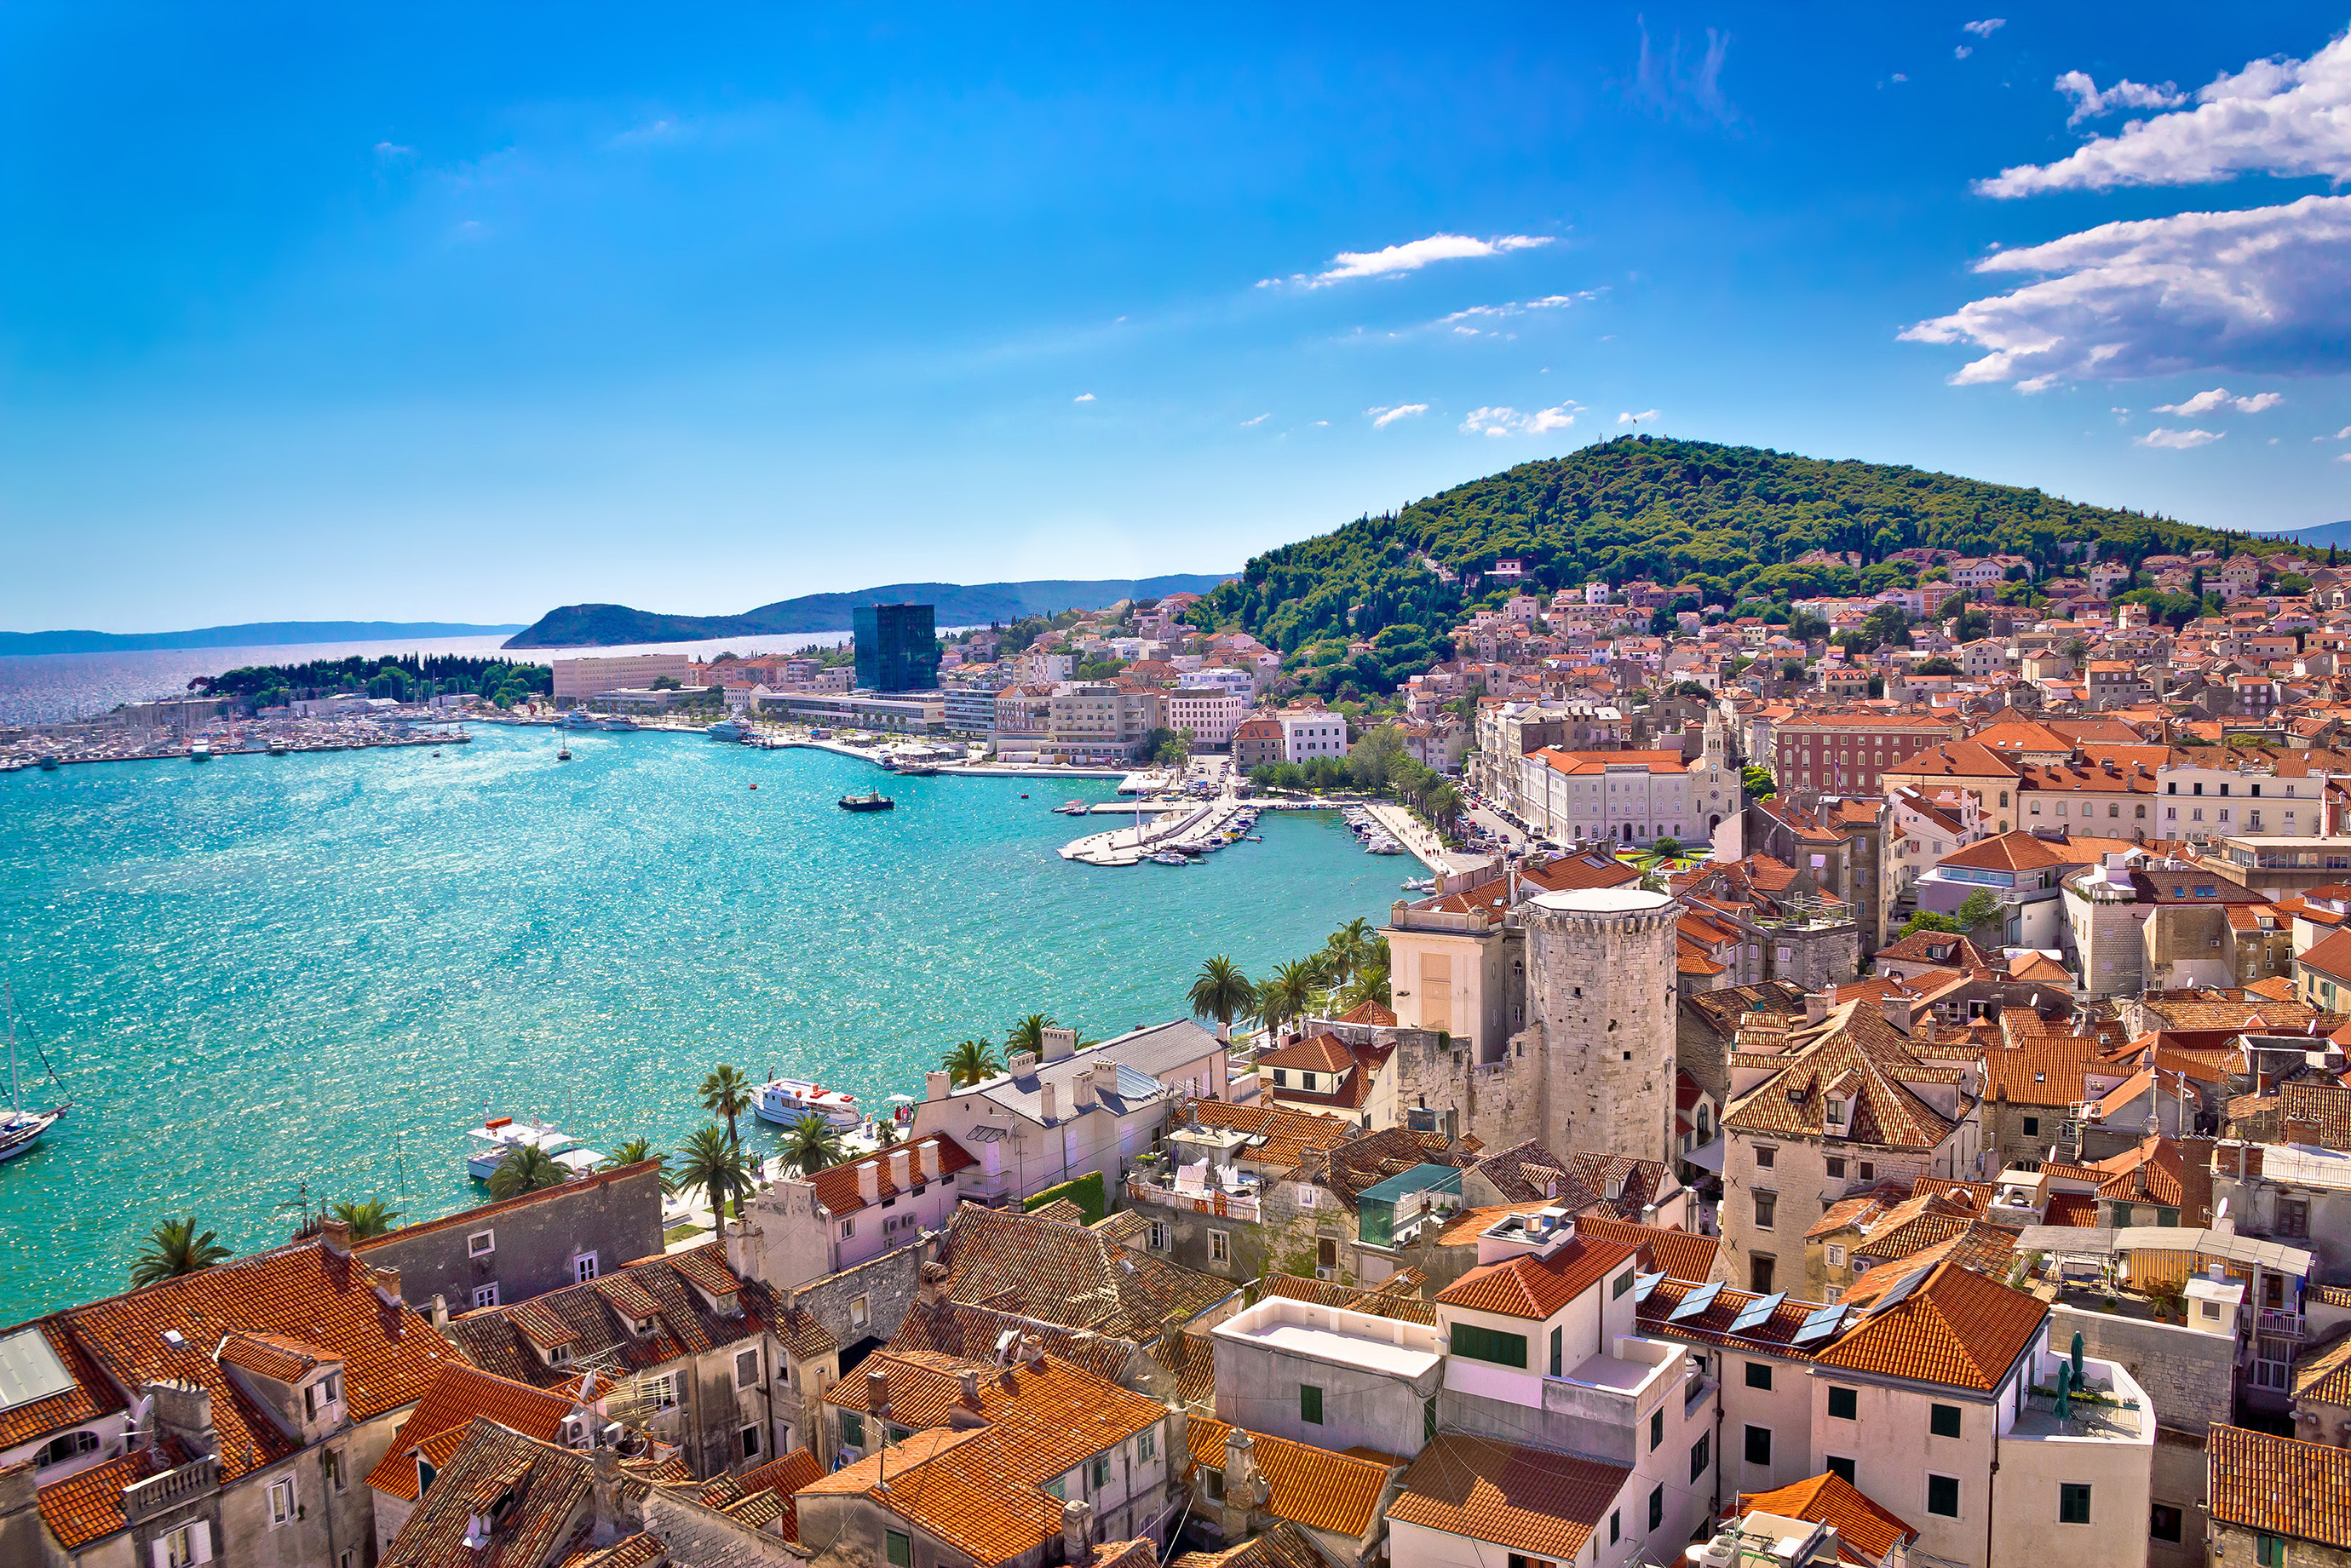 beach cities | Europe | beach cities in Europe | vacation | vacation destinations | destinations | travel | beach | European beach cities